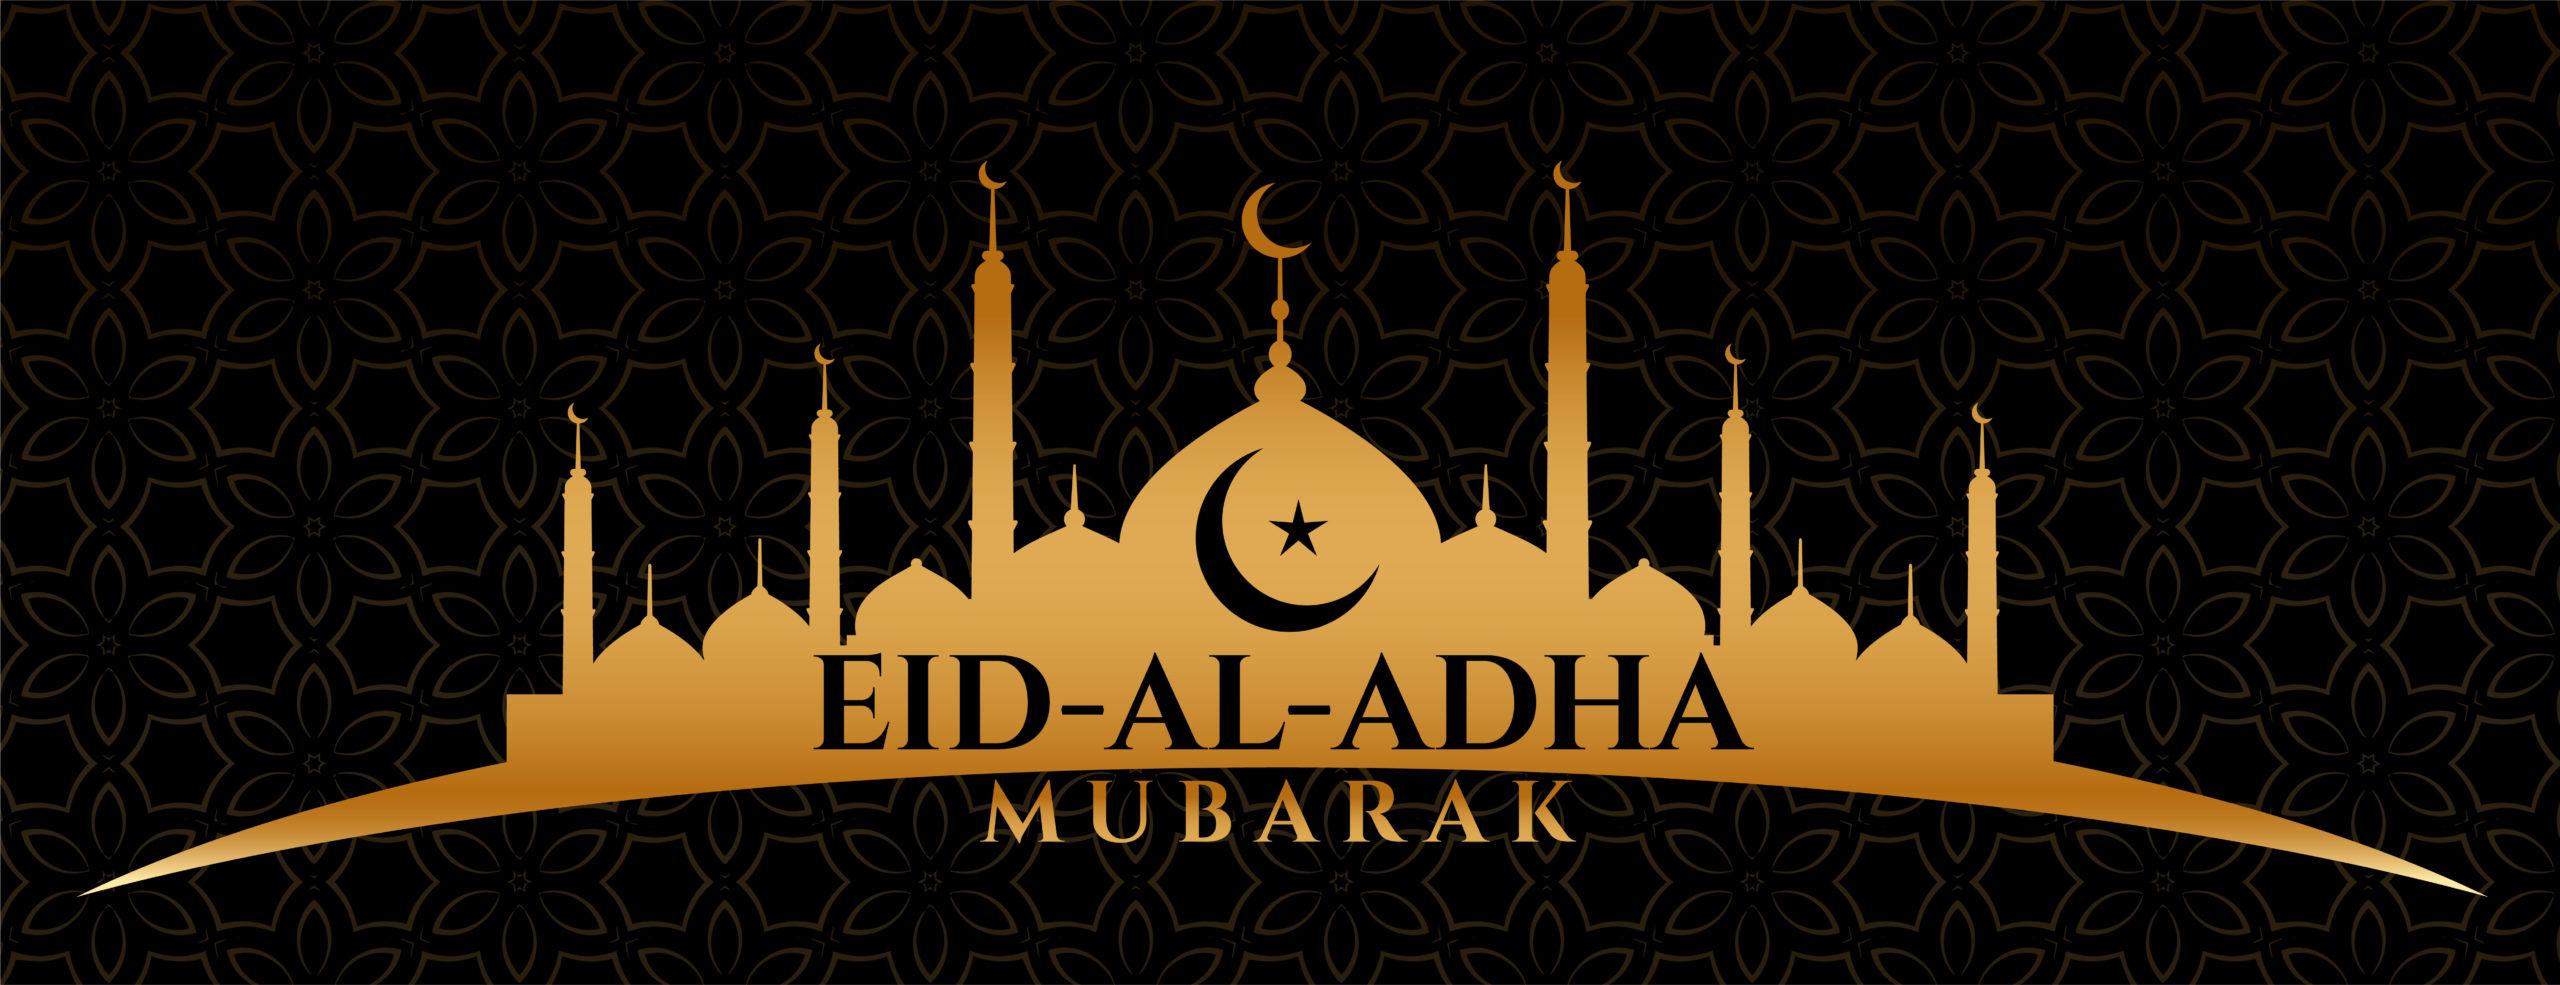 Eidul Adha Mubaarak